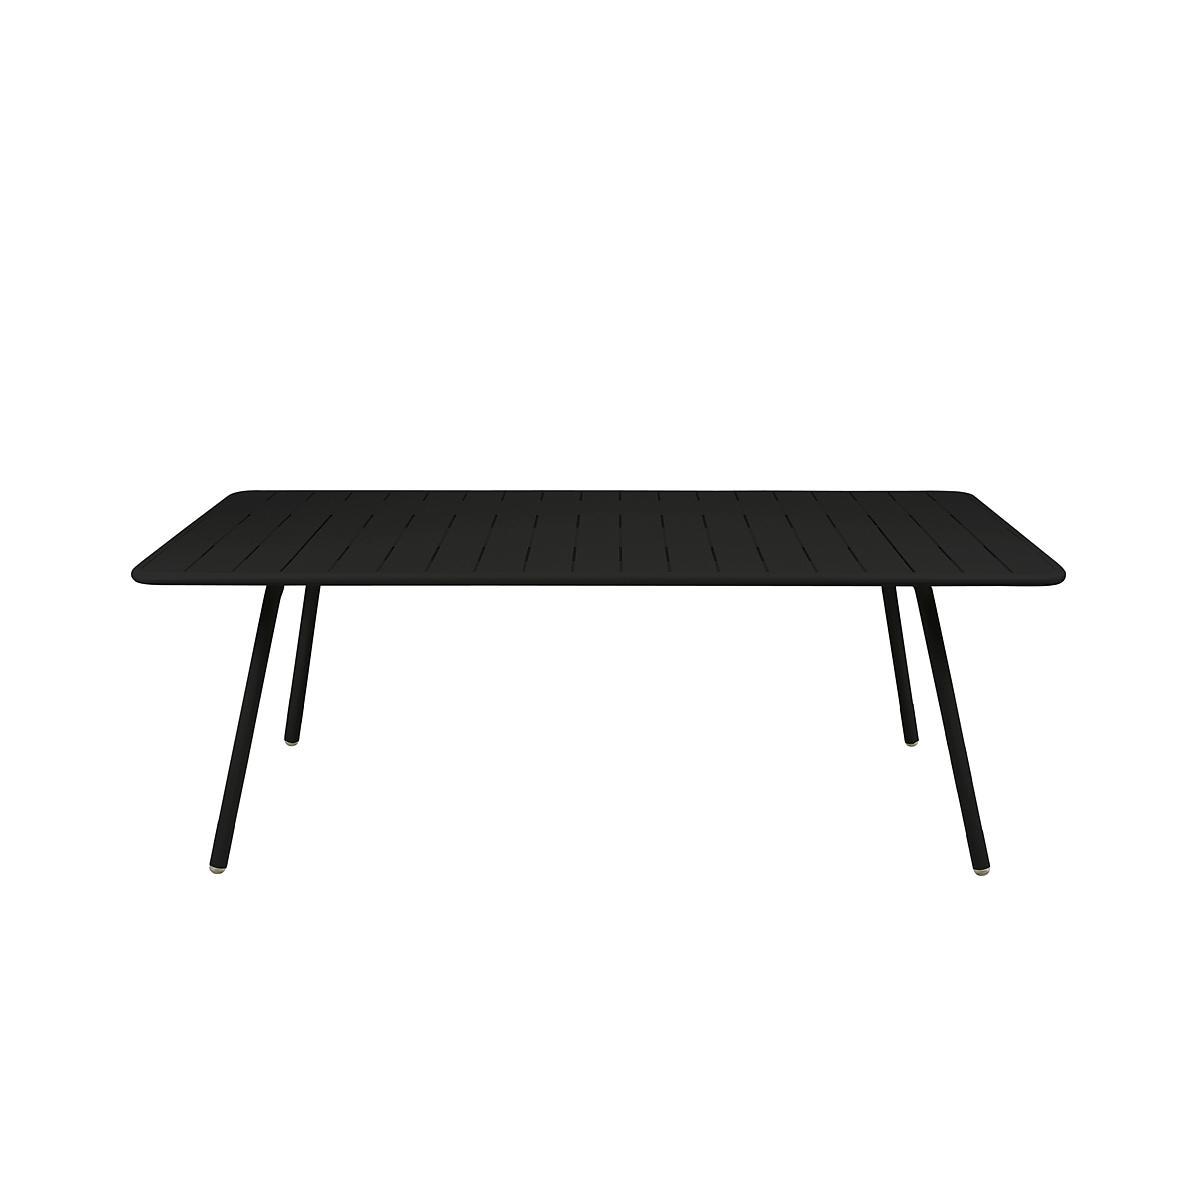 LUXEMBOURG by Fermob Table 8 personnes noir réglisse